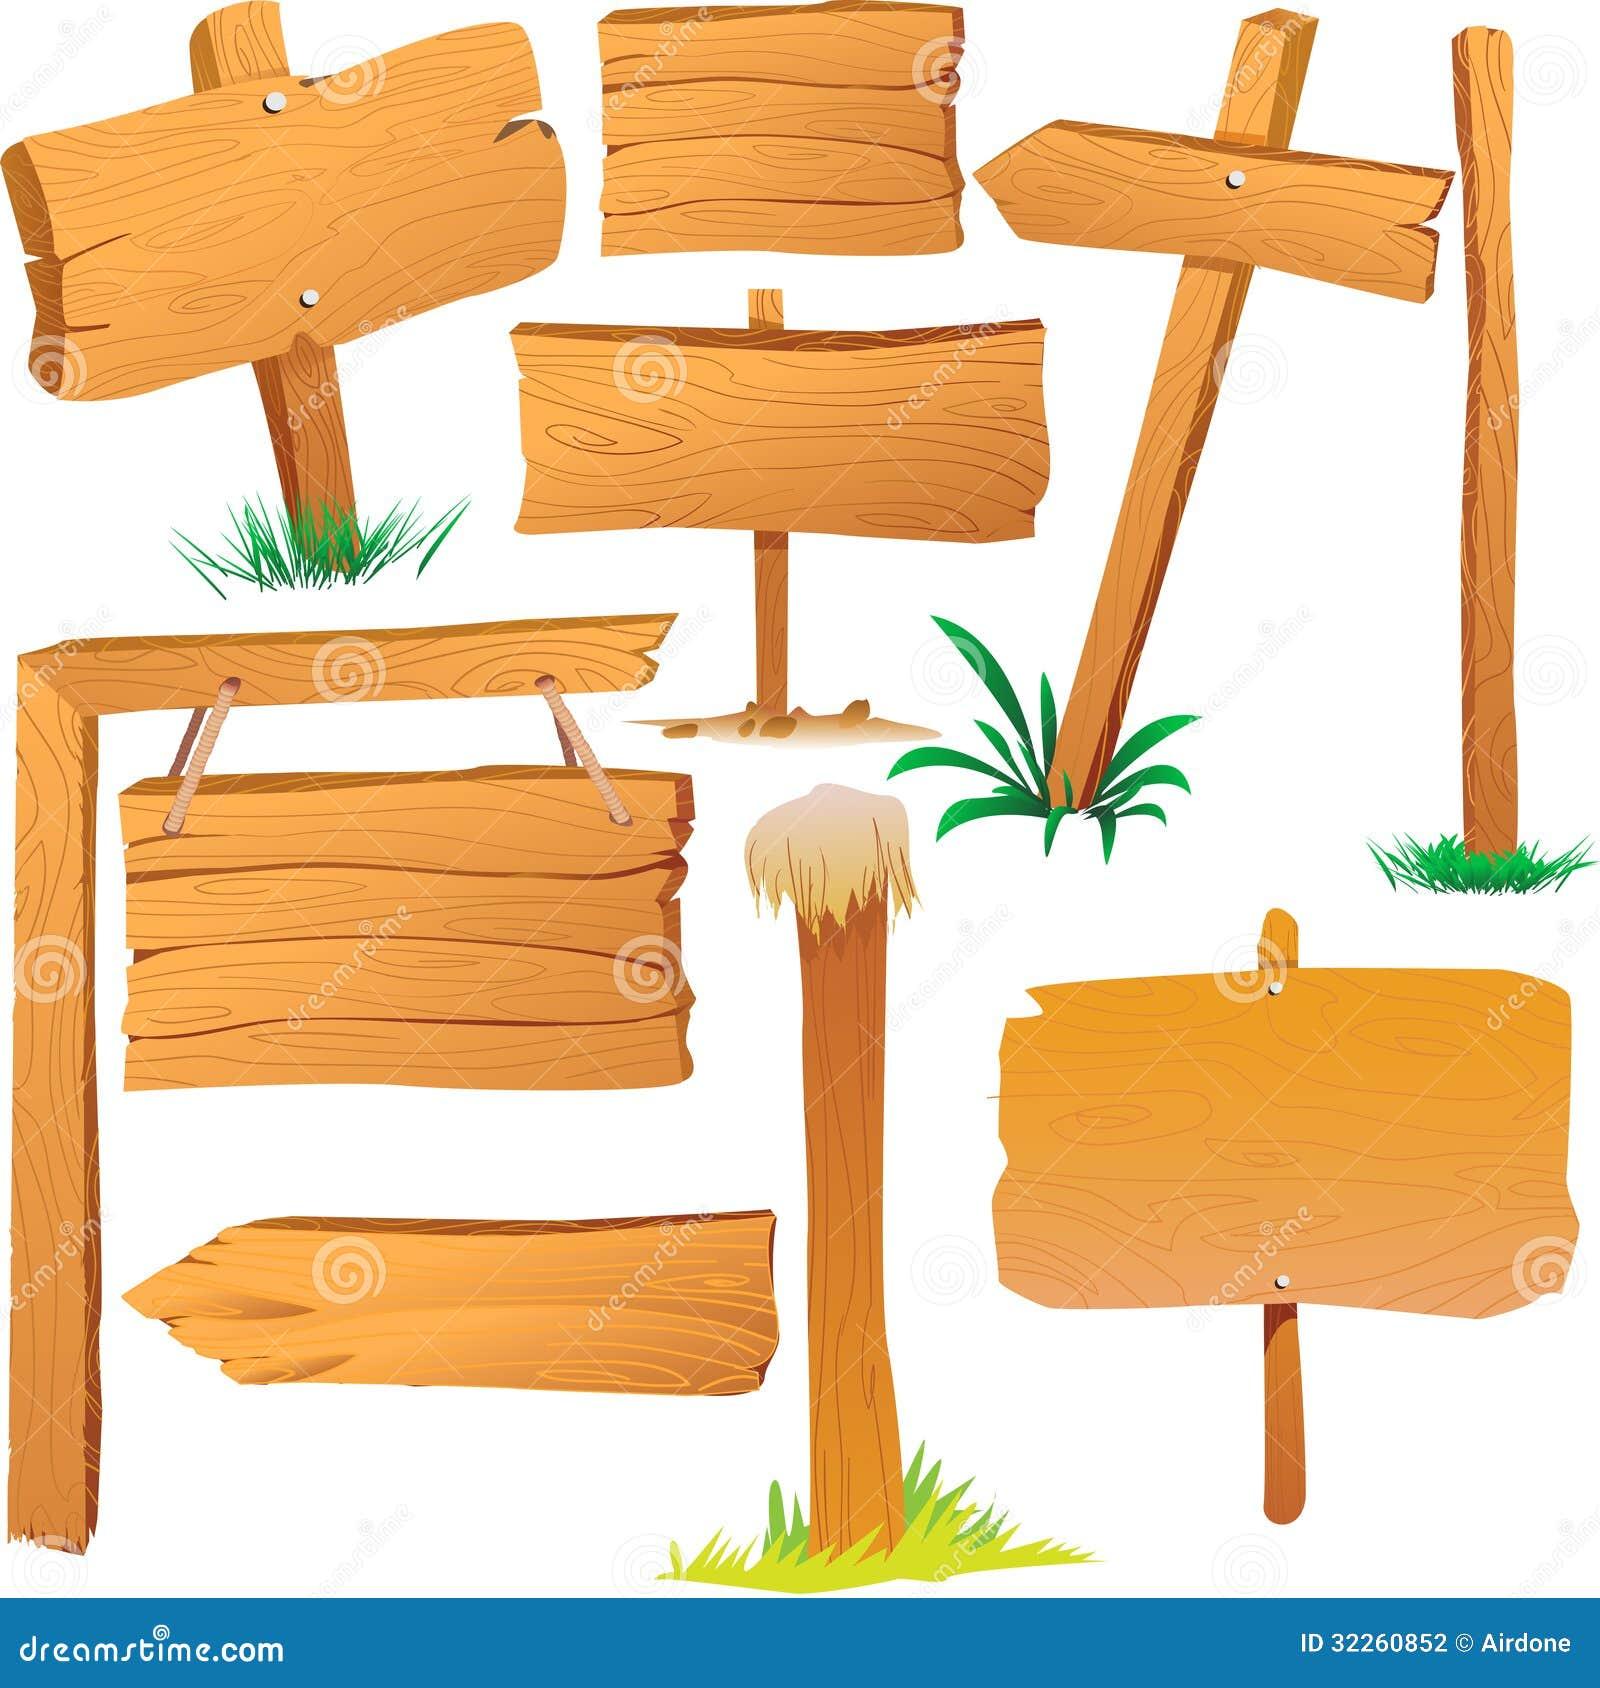 Cartoon Wood Board ~ Wooden sign boards stock vector illustration of comic